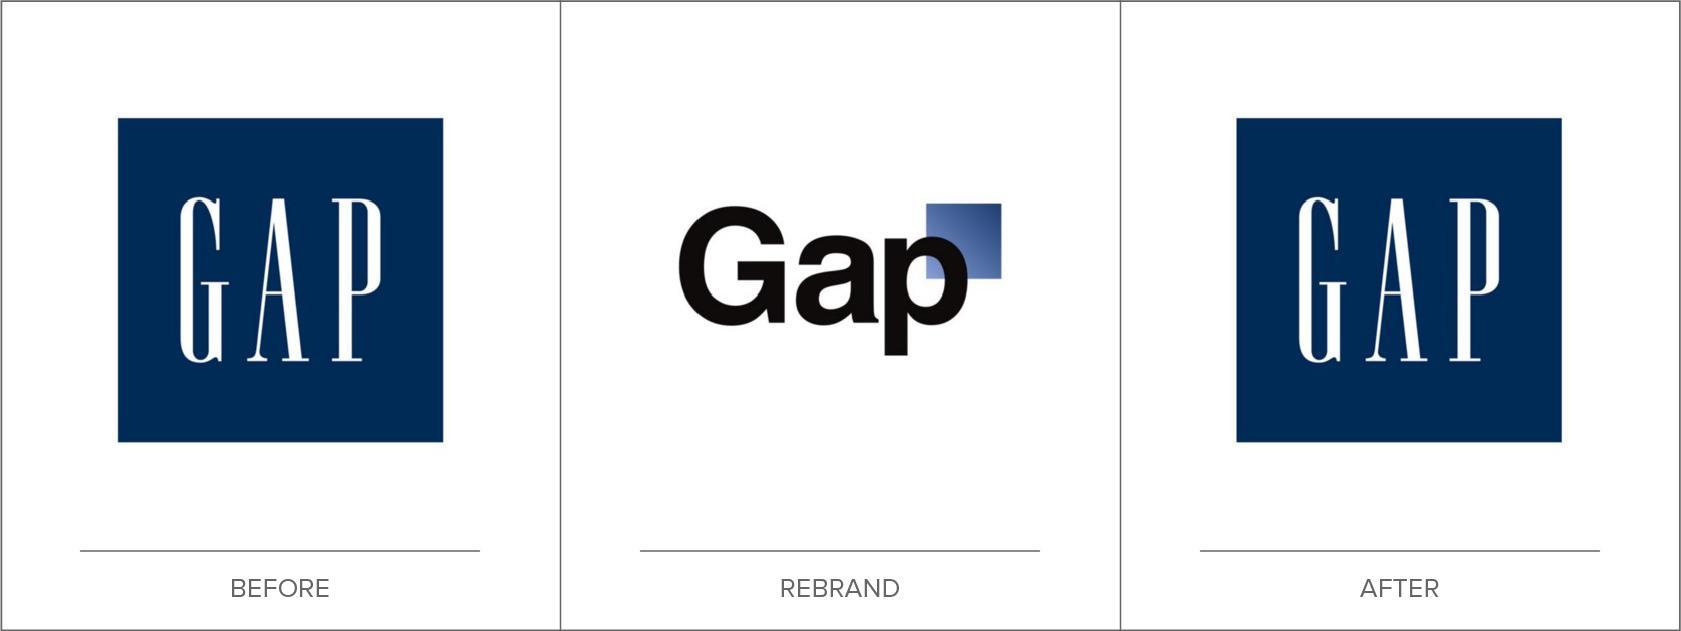 Gap had no rebrand implementation plan.